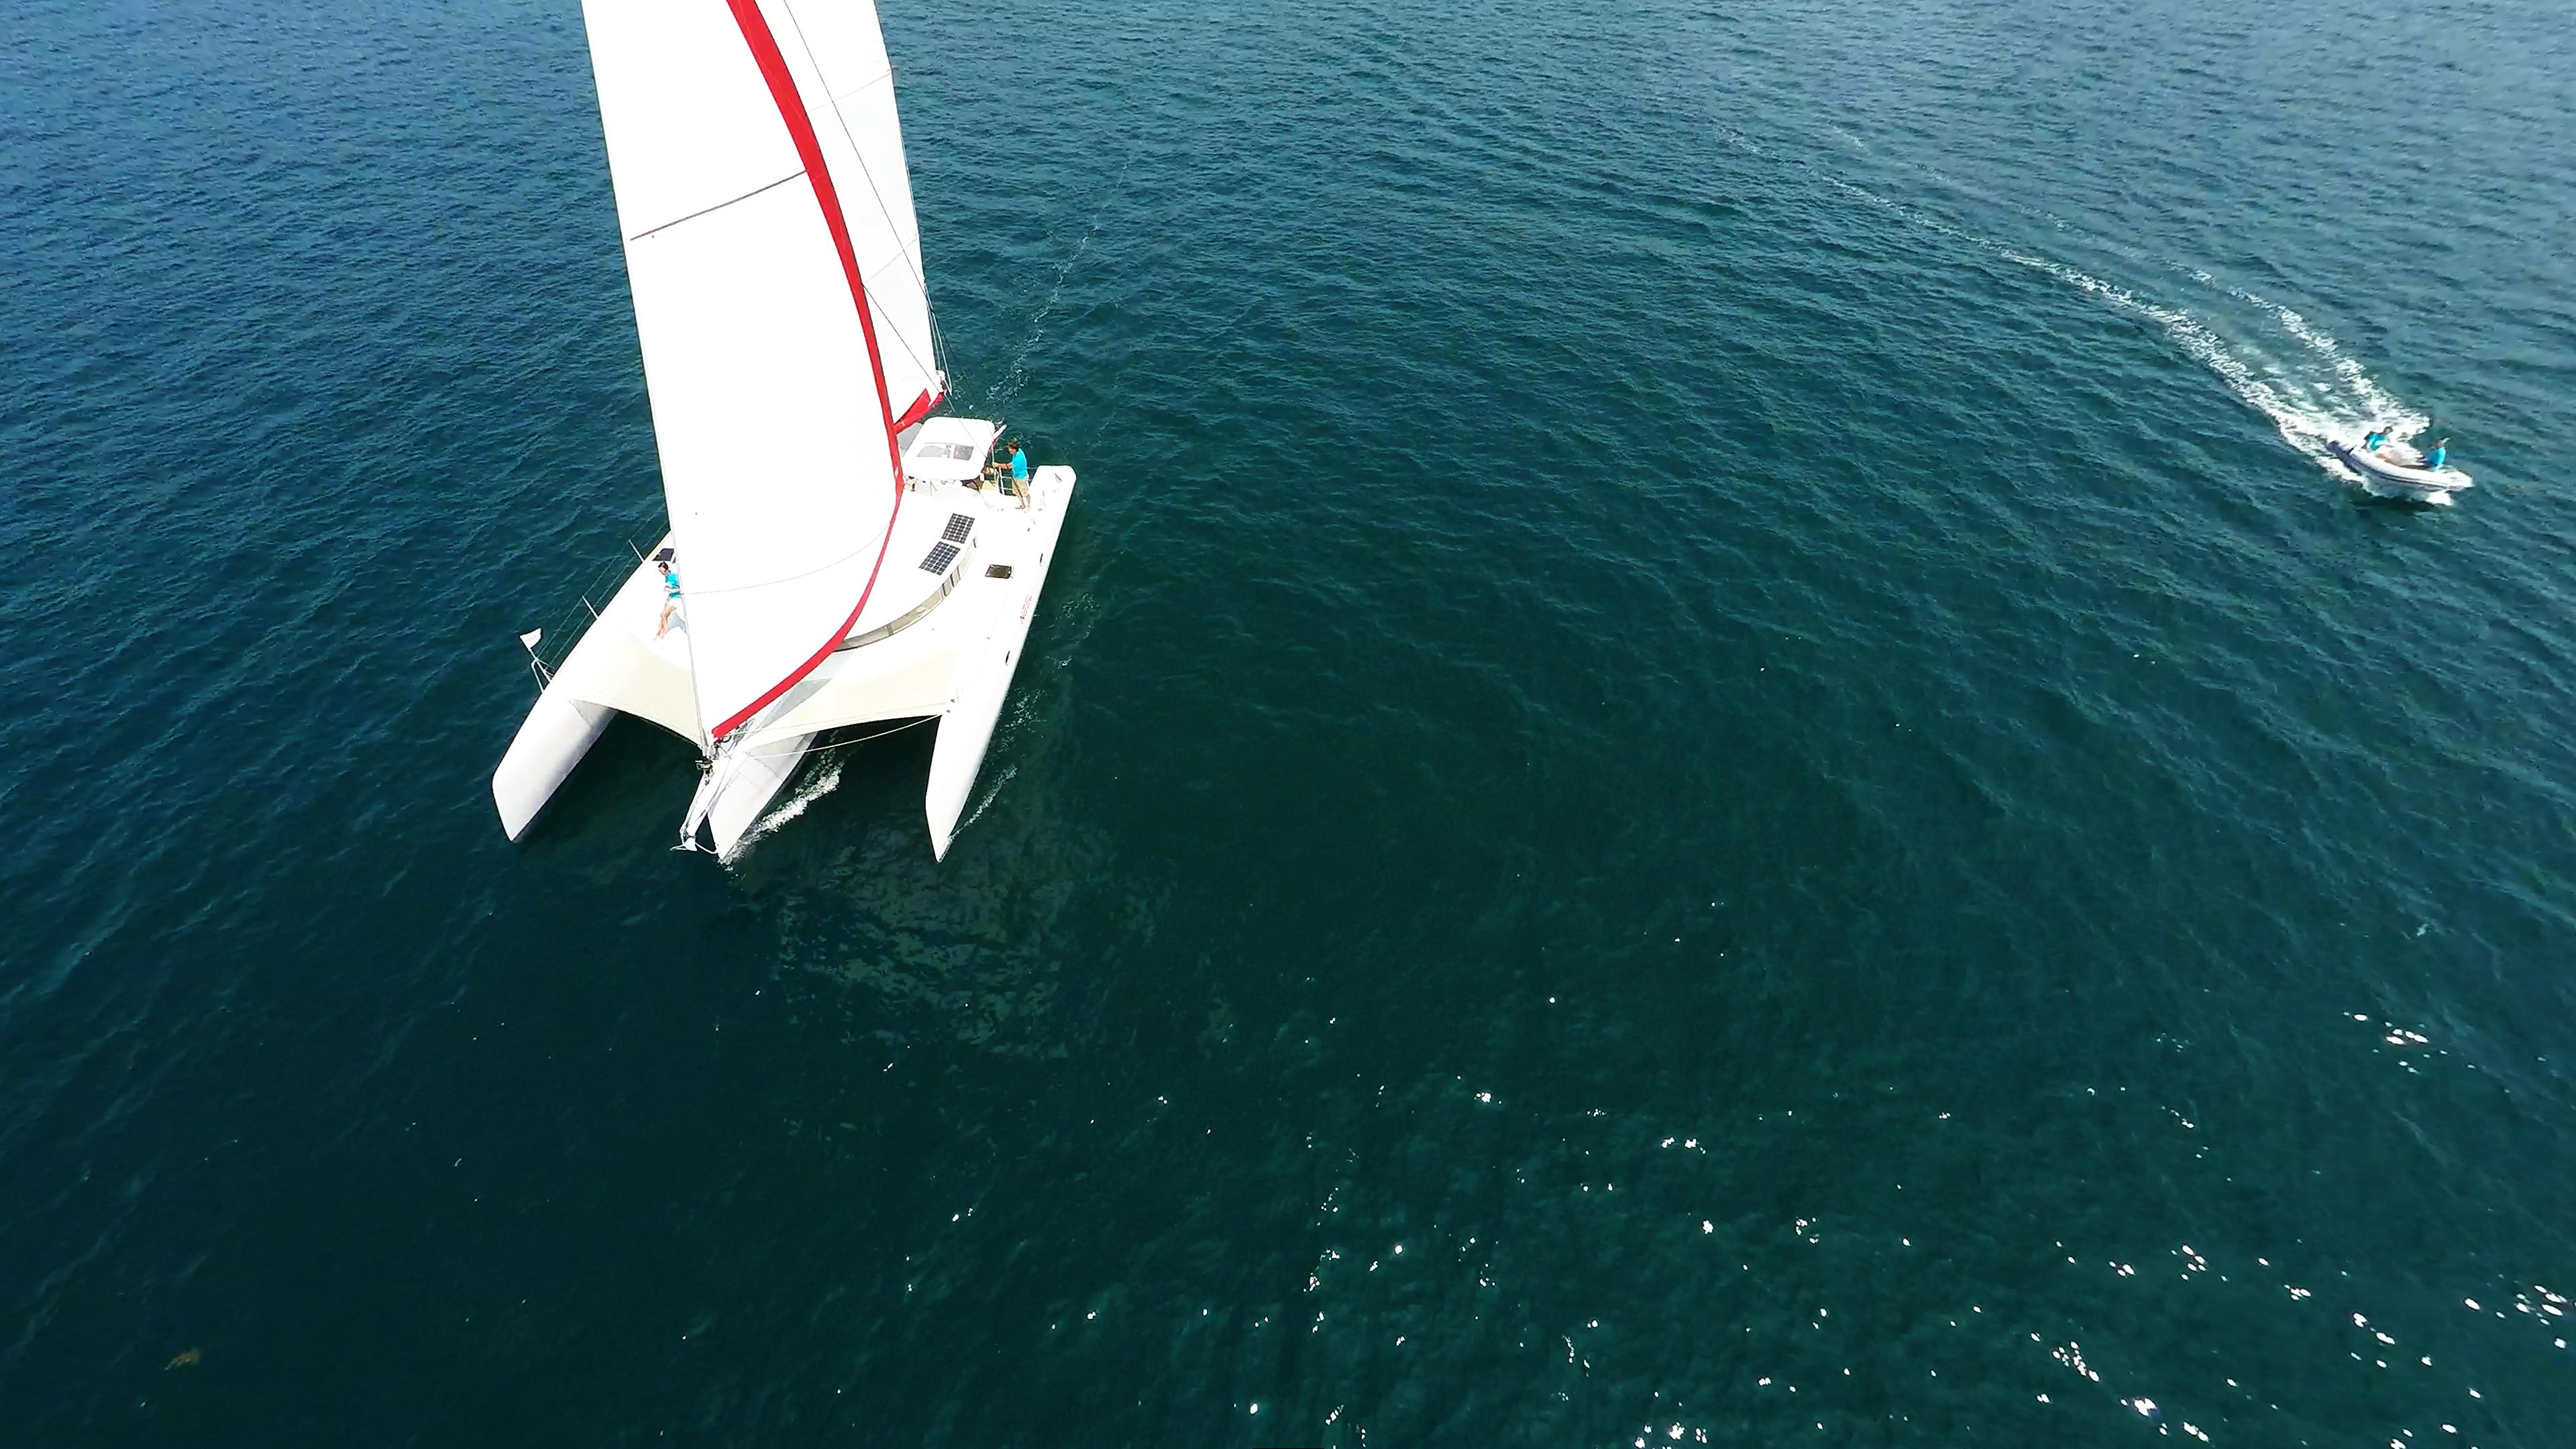 imbarcazioneing trimarano neel 45 tender gommone veleggia